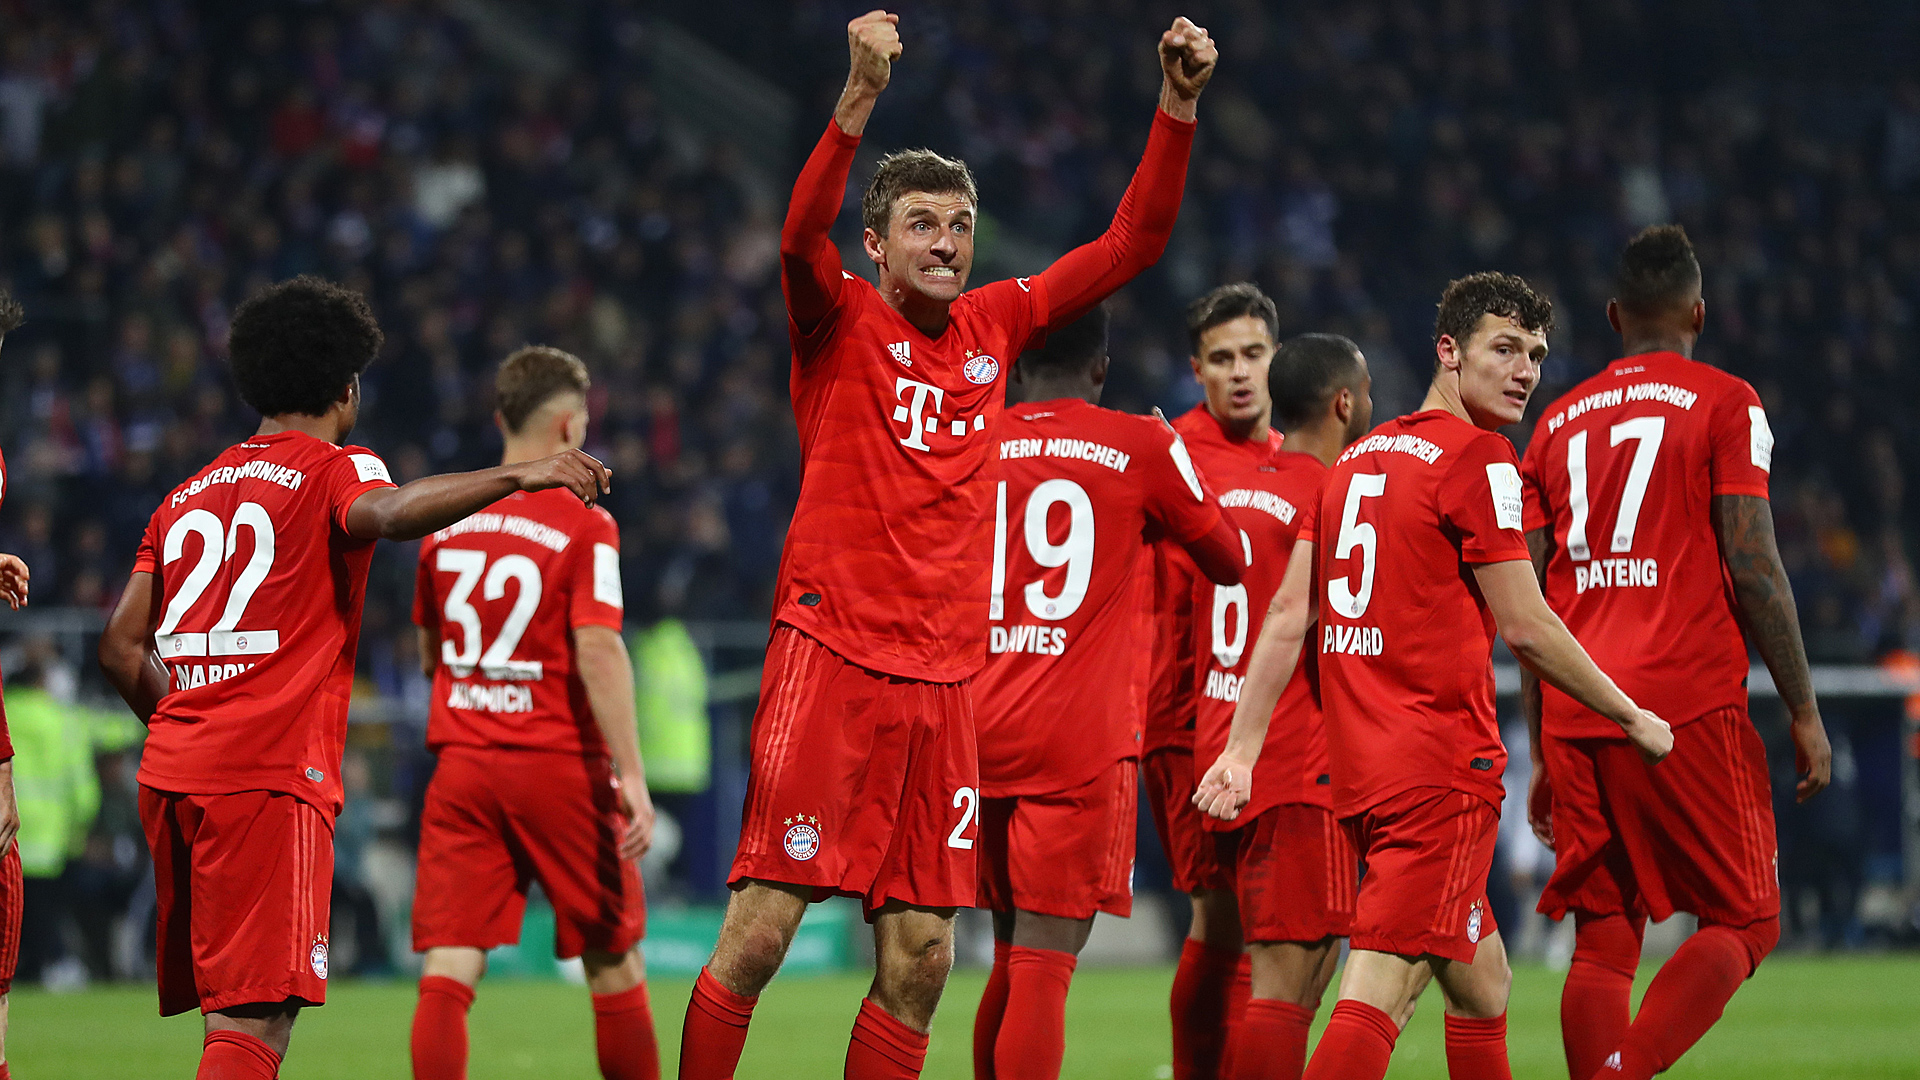 Wer Zeigt Ubertragt Fc Bayern Munchen Vs Bvb Live Im Tv